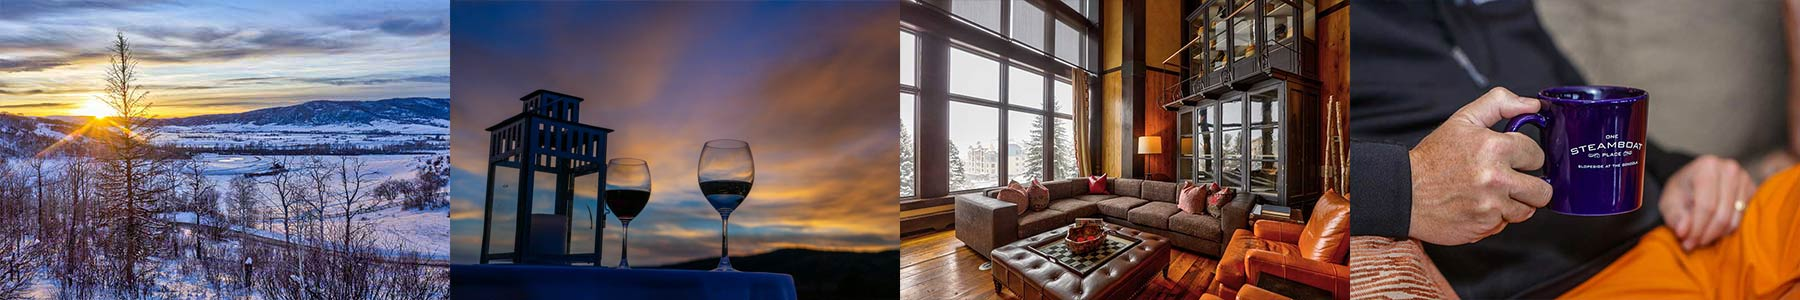 photo reel - Alpine Mountain Summit Club